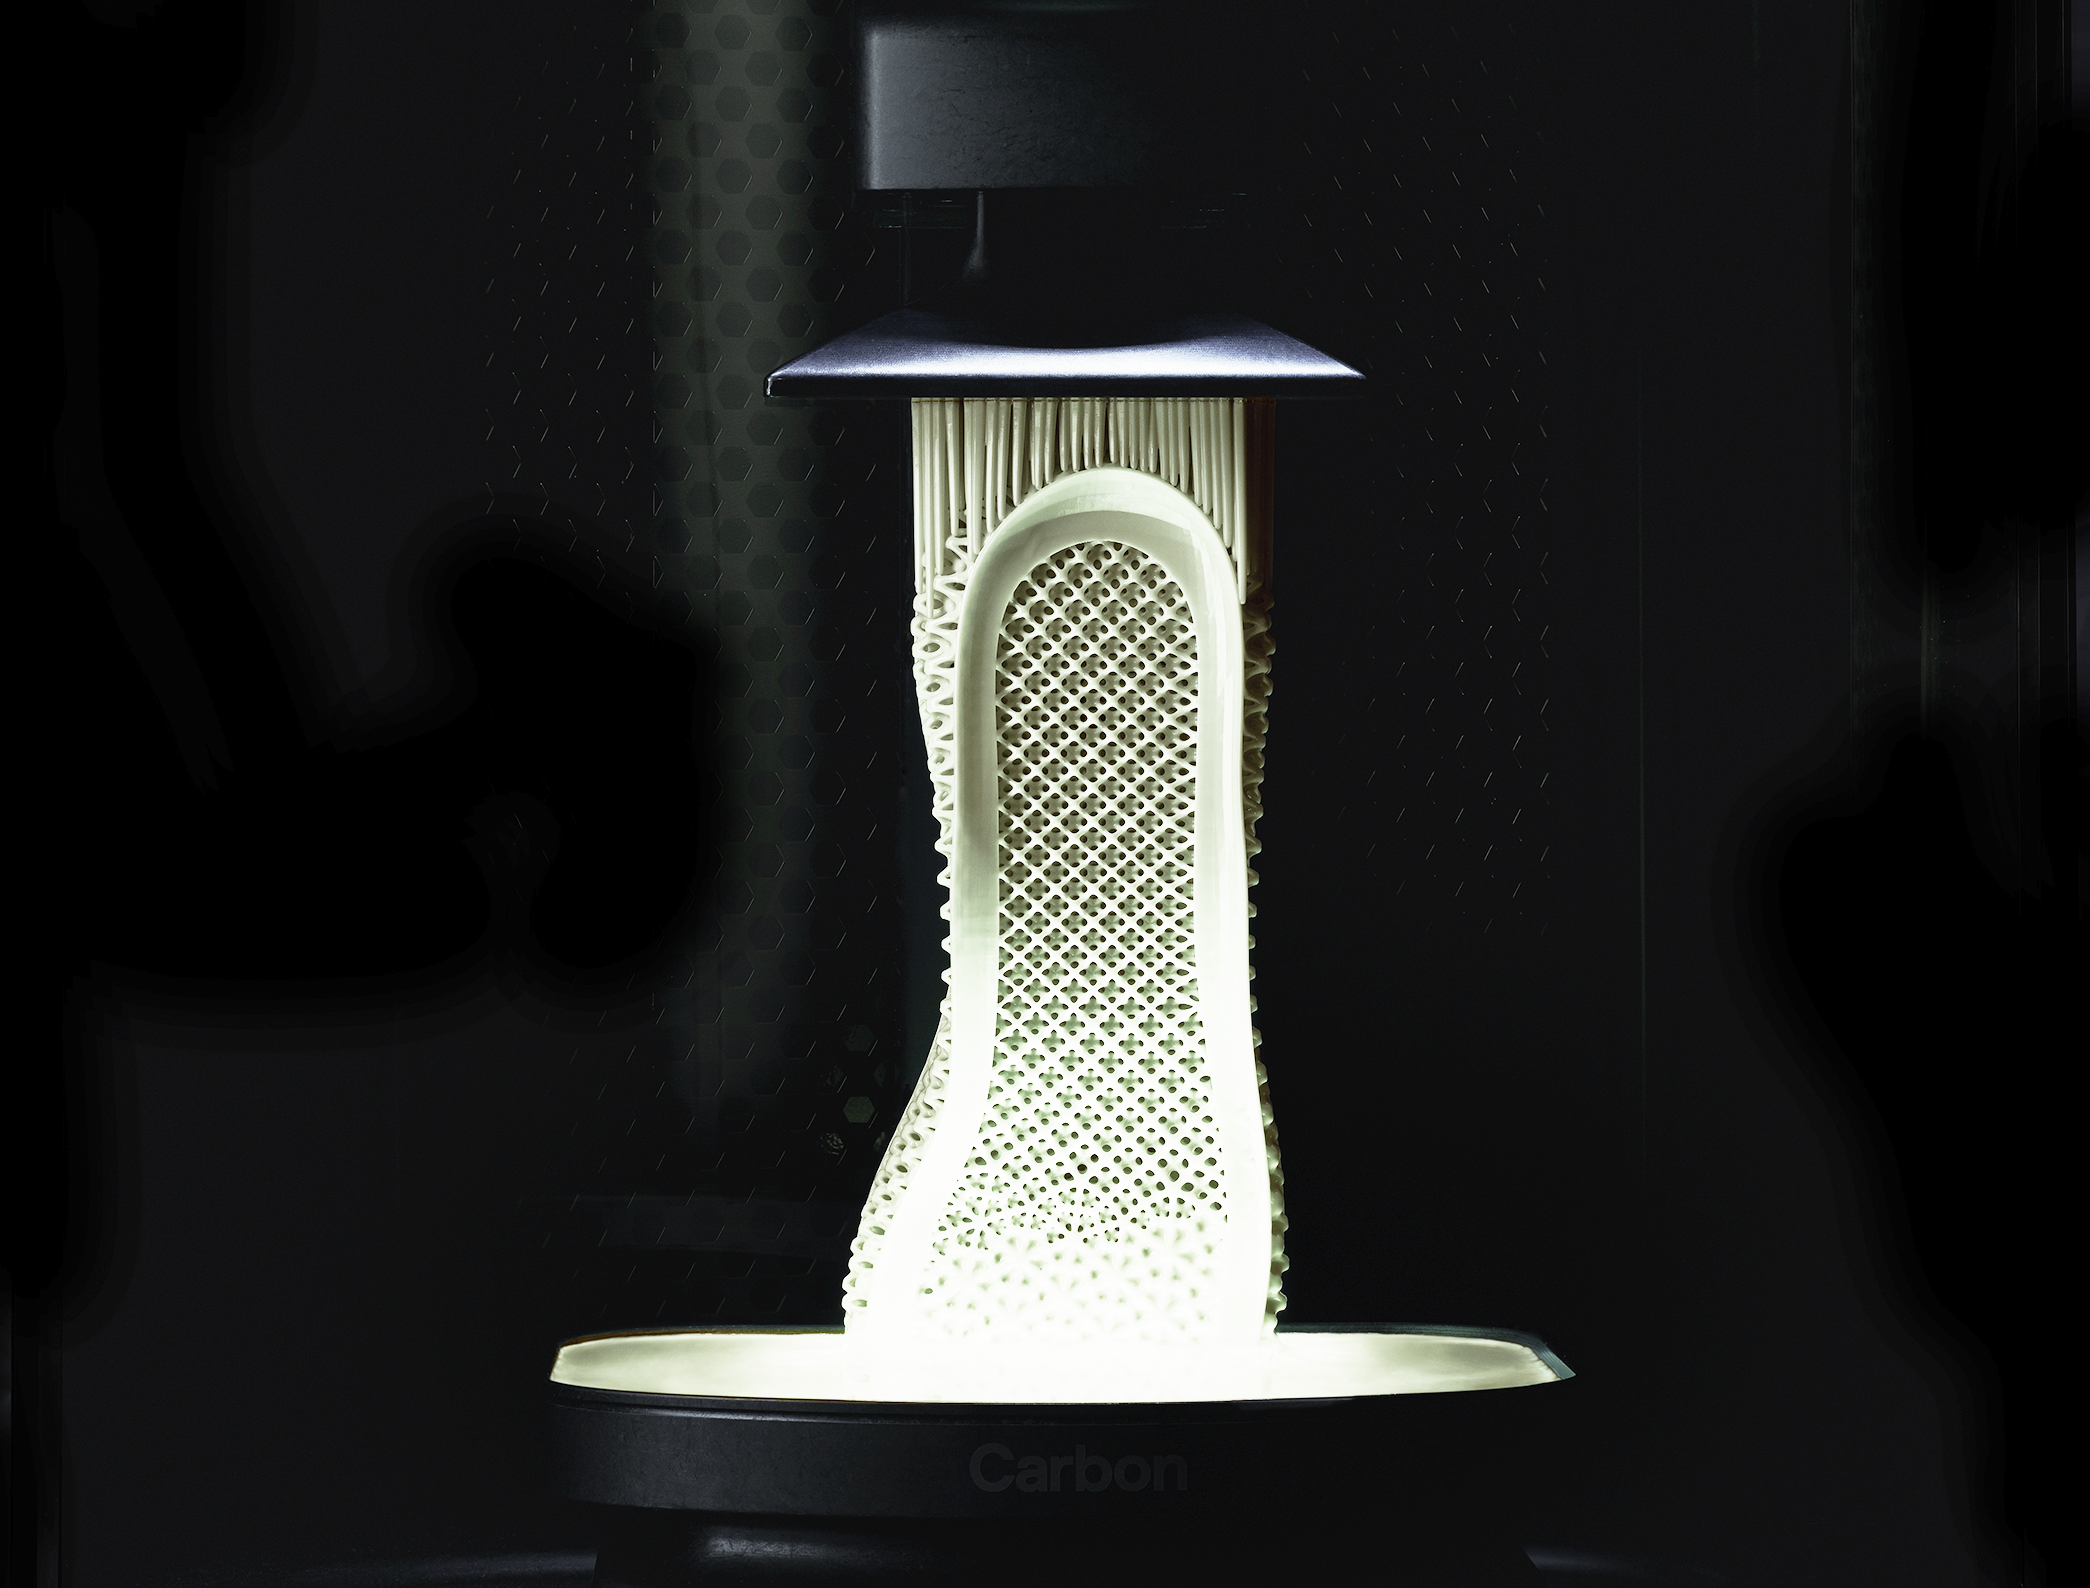 Carbon 3D printer making end part components for footwear